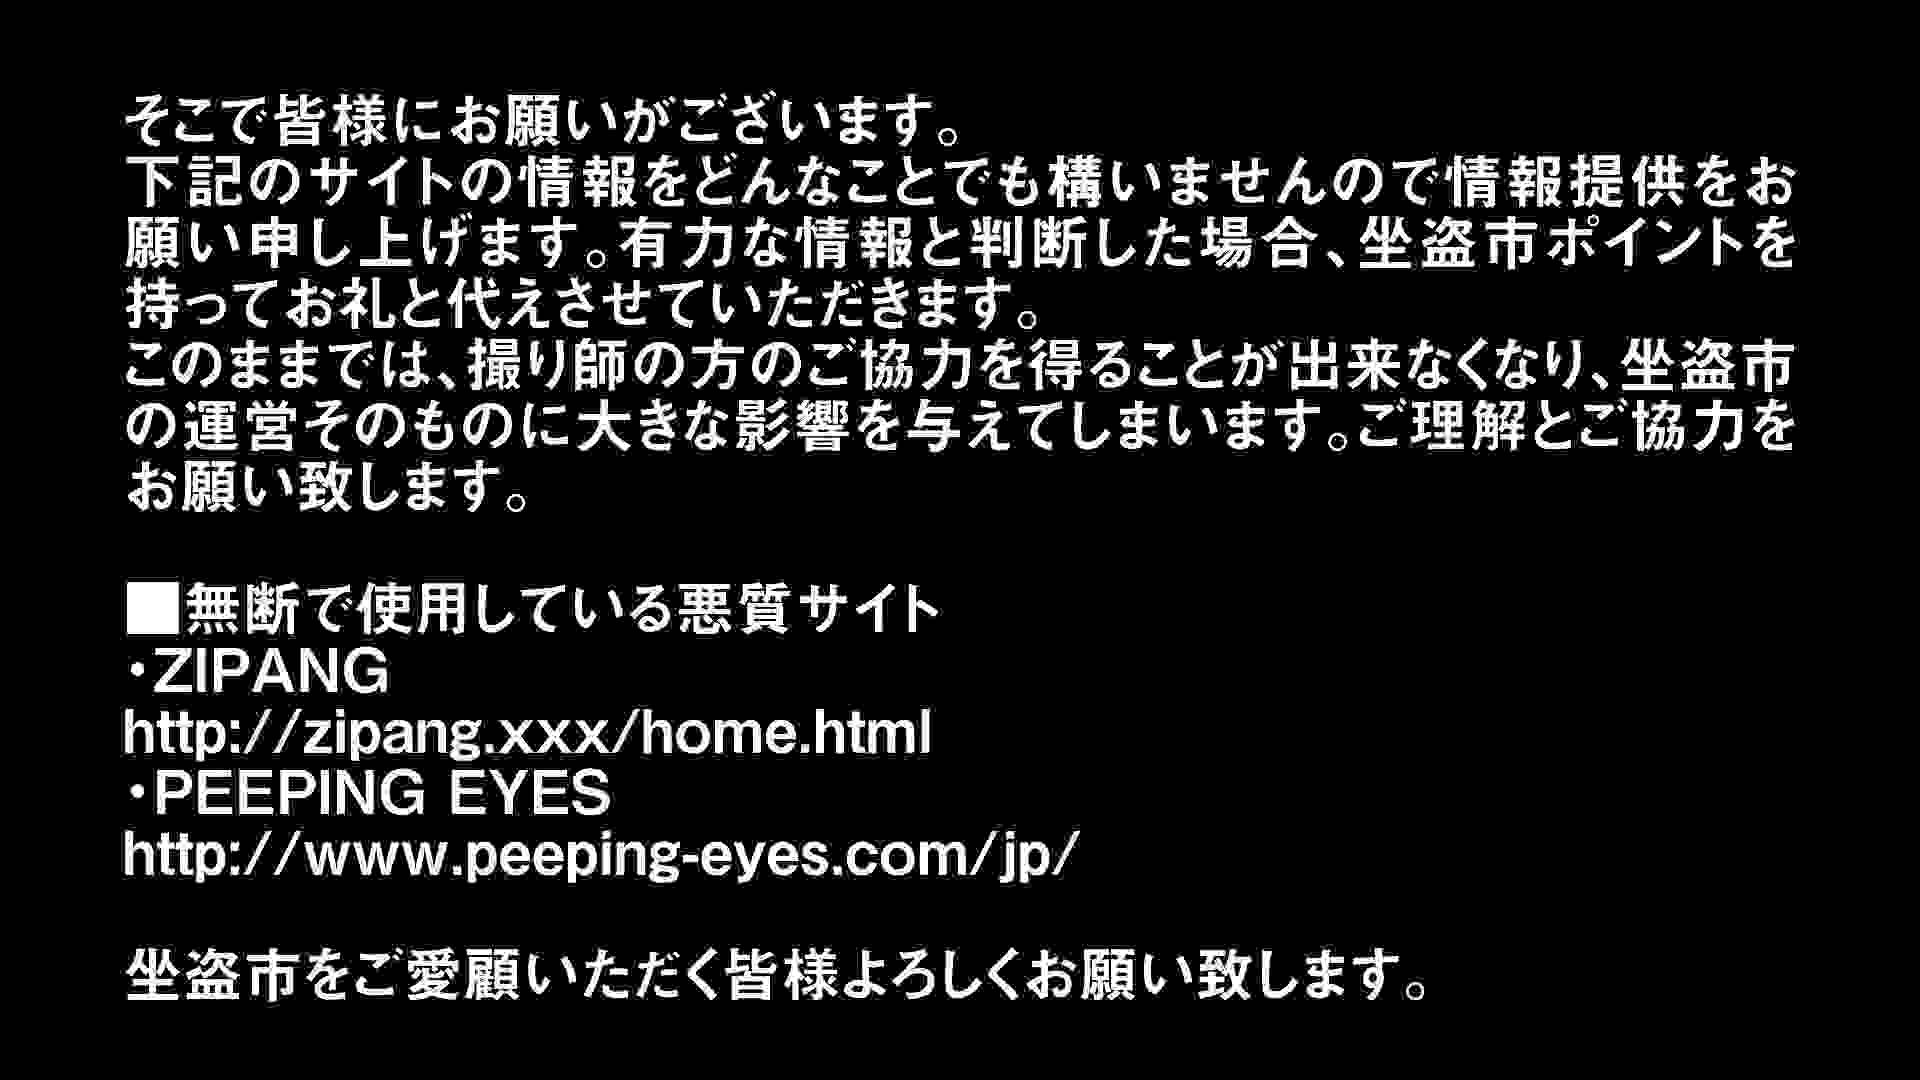 Aquaな露天風呂Vol.294 OLセックス | 盗撮  75画像 22